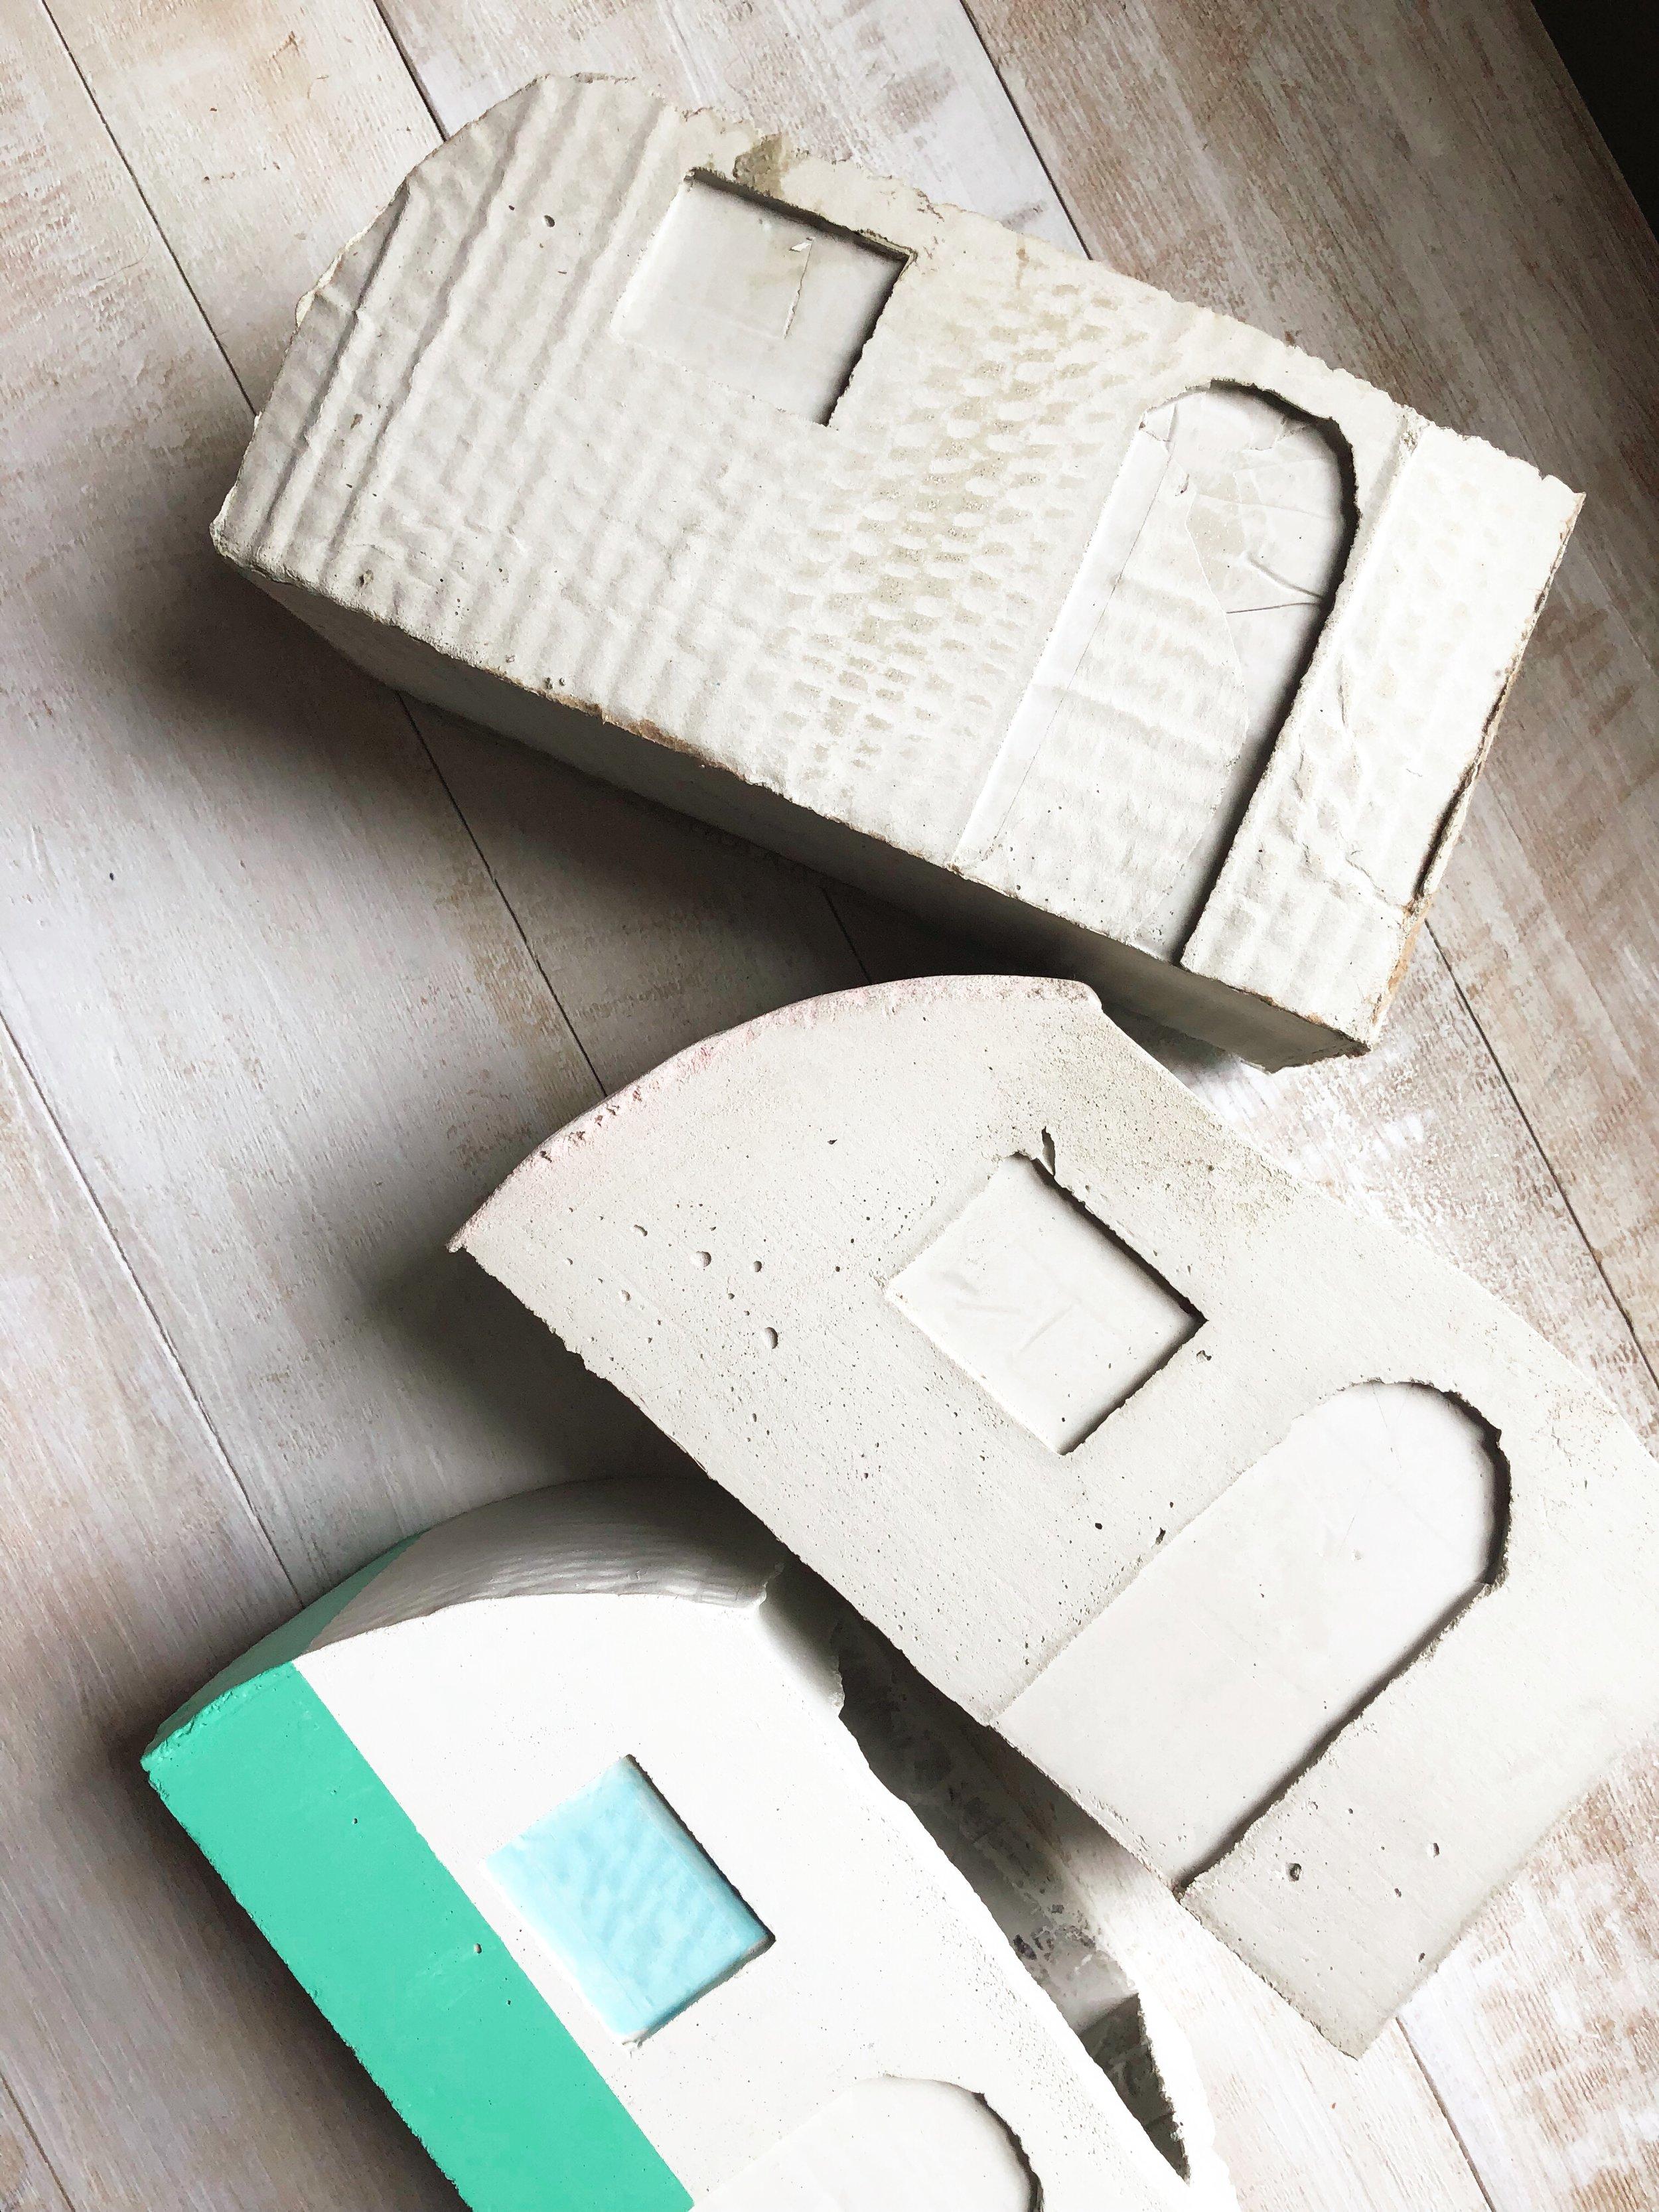 DIY Vintage Concrete Camper Planter. Create a vintage inspired concrete planter, perfect for those summer vibes!  #hgtv #hgtvhandmade #concrete #planter #rv #roadtrip #camper #summercraft #summerDIY #concretecraft #cementcraft #concretemold #succulents #cactus #flamingo